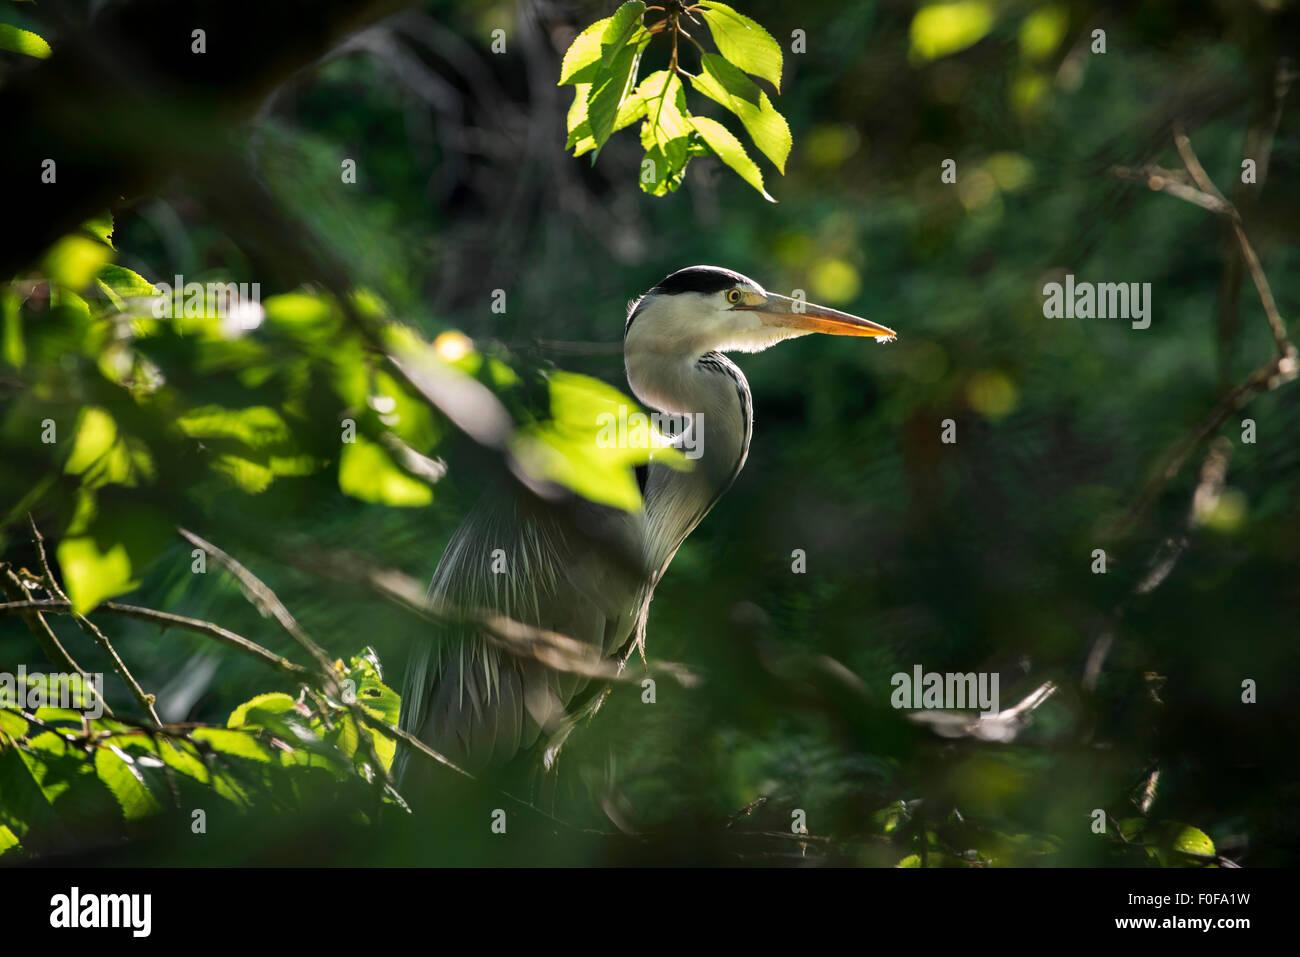 Grey heron (Ardea cinerea) hidden in vegetation - Stock Image